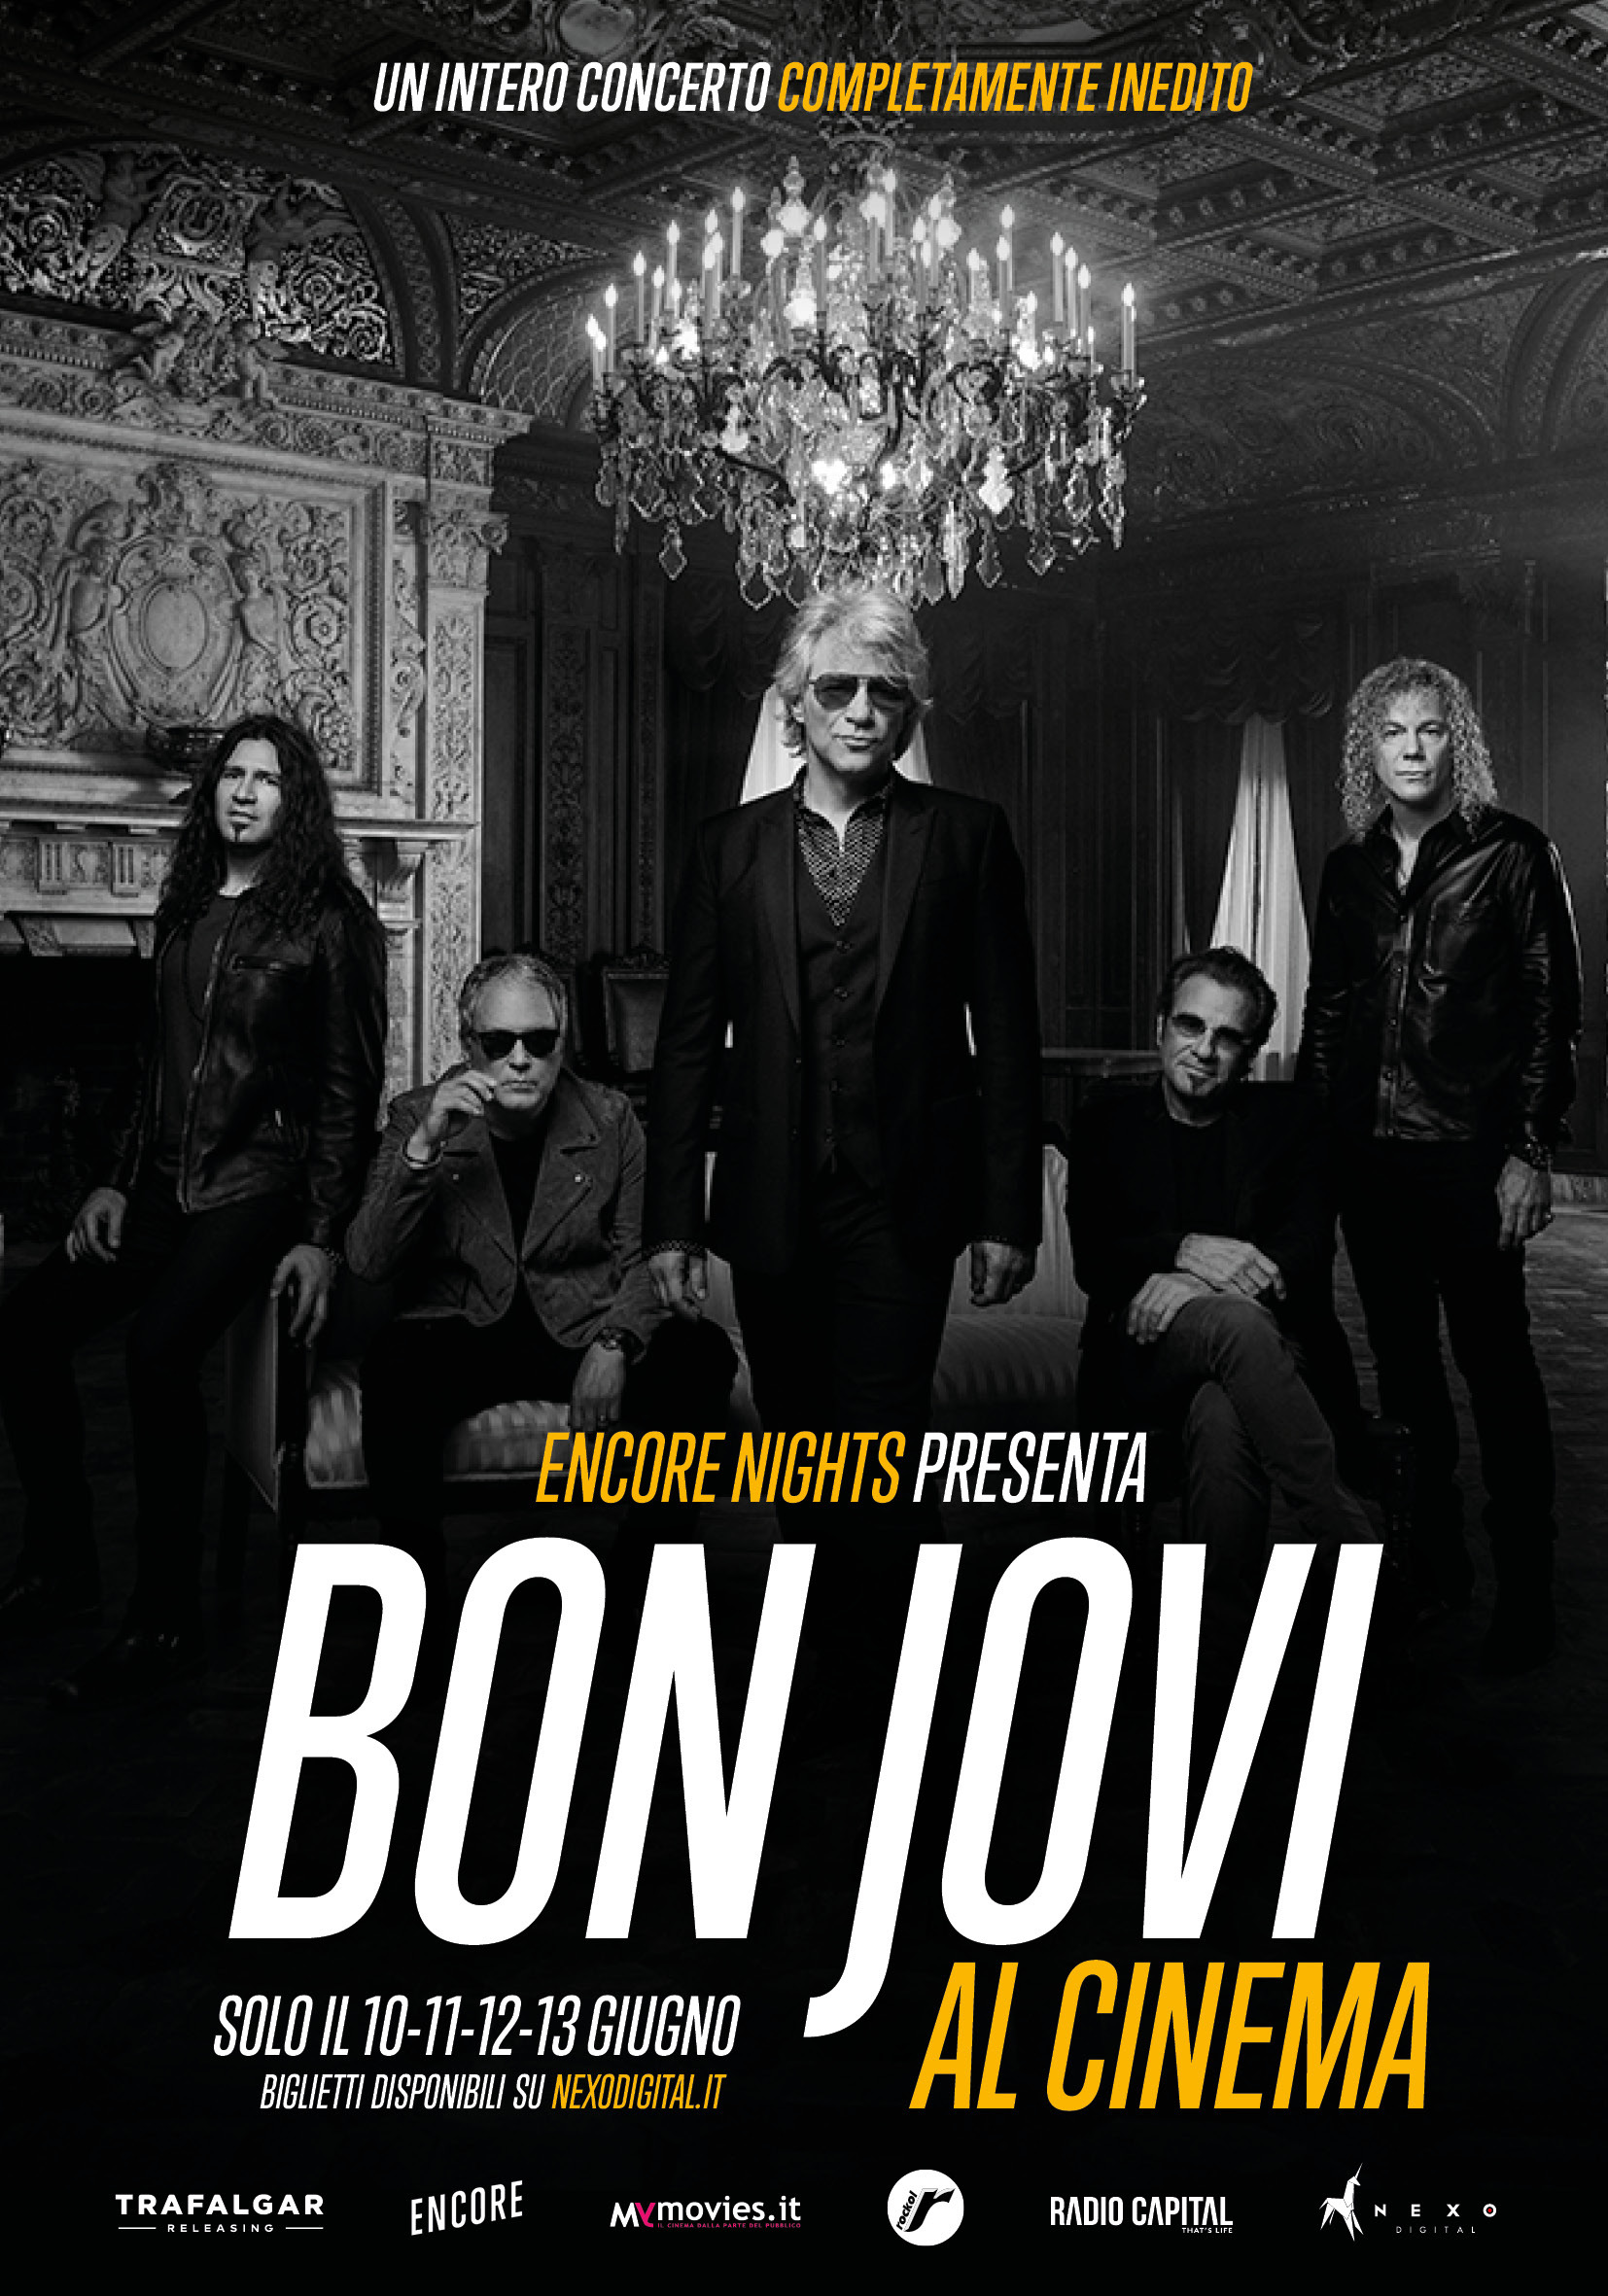 Bon Jovi From - Encore Nights